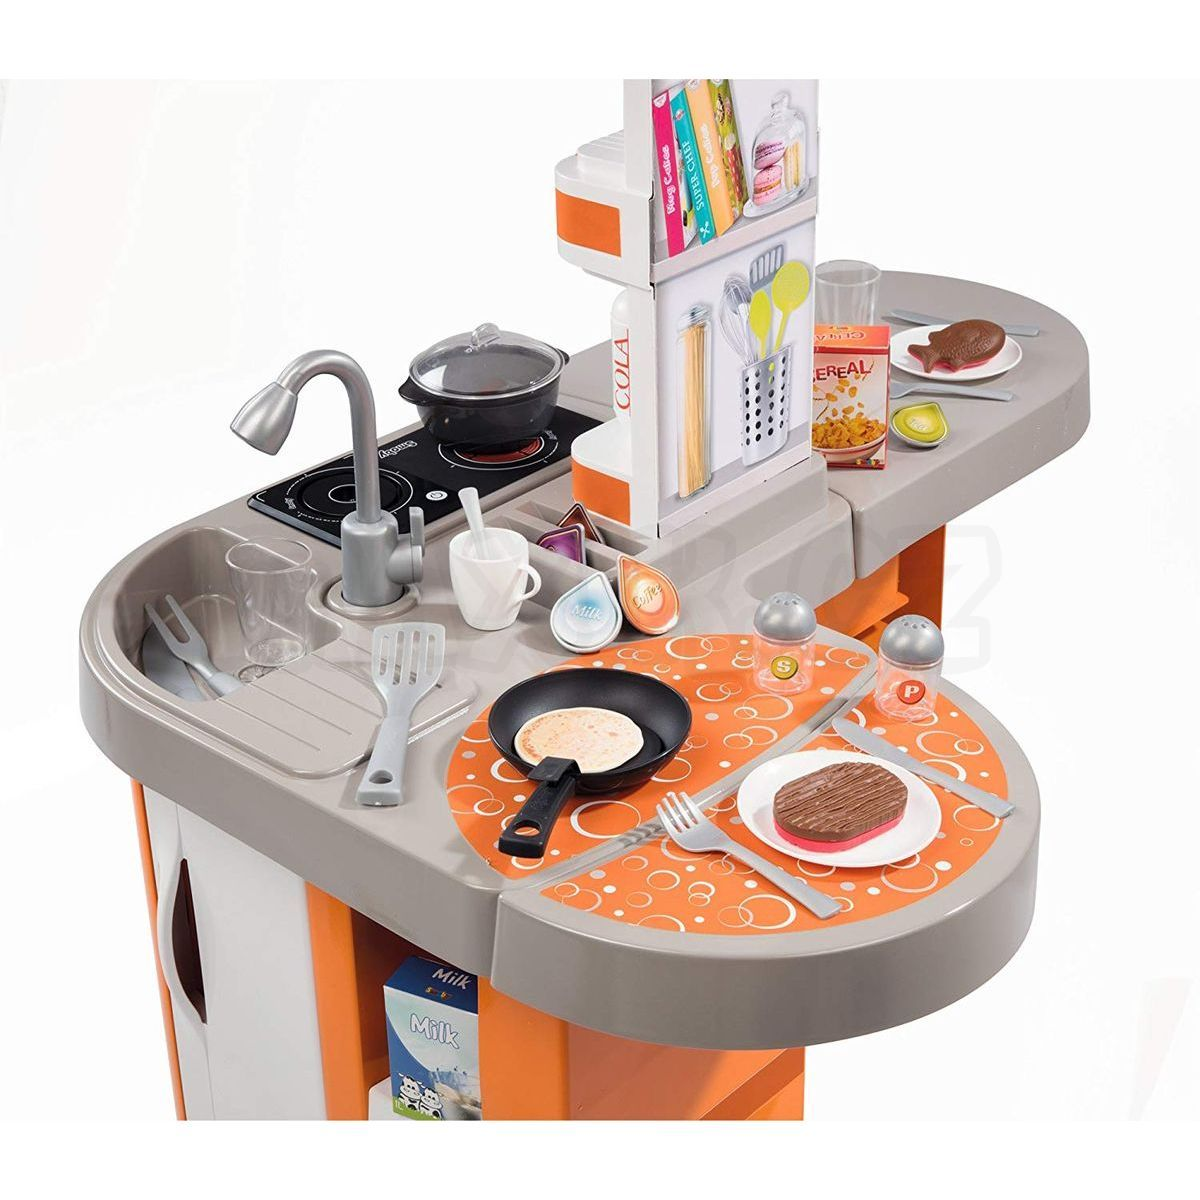 8419592c7 ... Smoby Kuchyňka Tefal Studio XL Bubble oranžovo-šedá elektronická 7